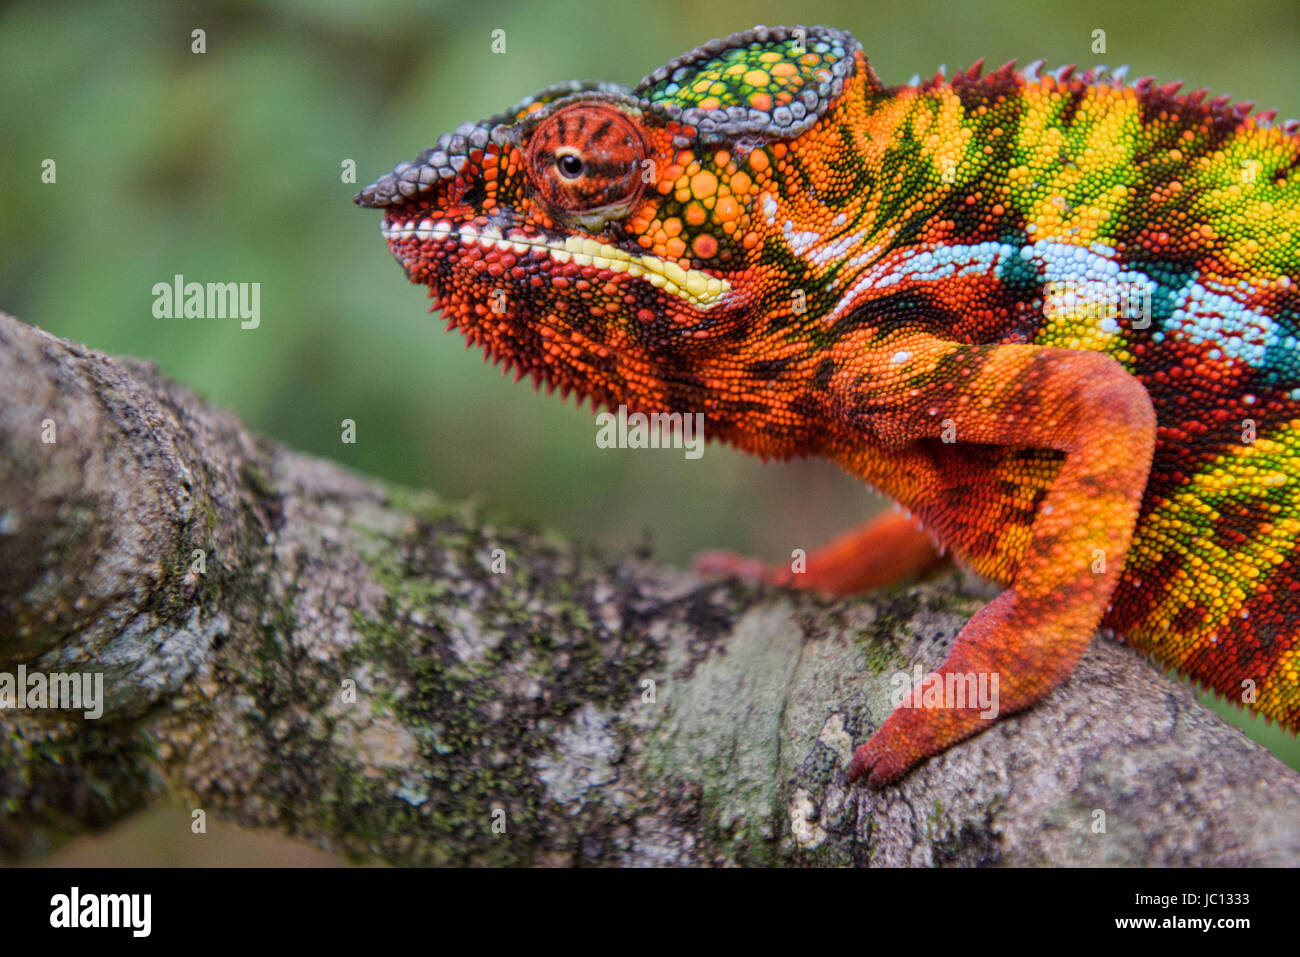 Colorido camaleón pantera (Furcifer pardalis), el Parque Nacional de Andasibe-Mantadia, Madagascar Imagen De Stock